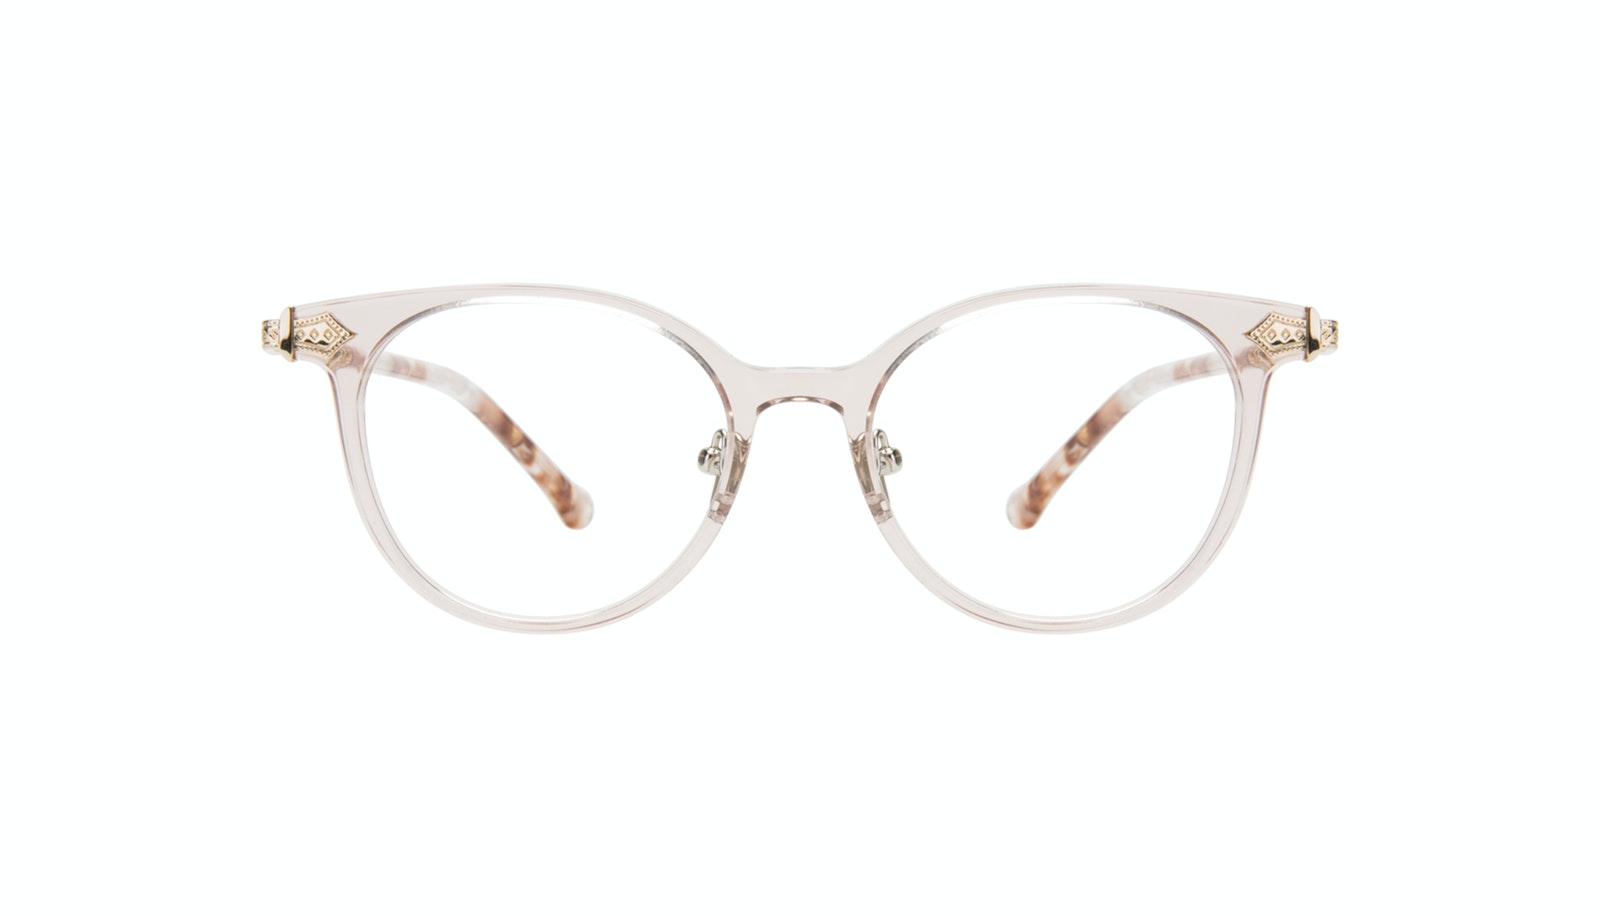 Affordable Fashion Glasses Round Eyeglasses Women Gem Pink Quartz